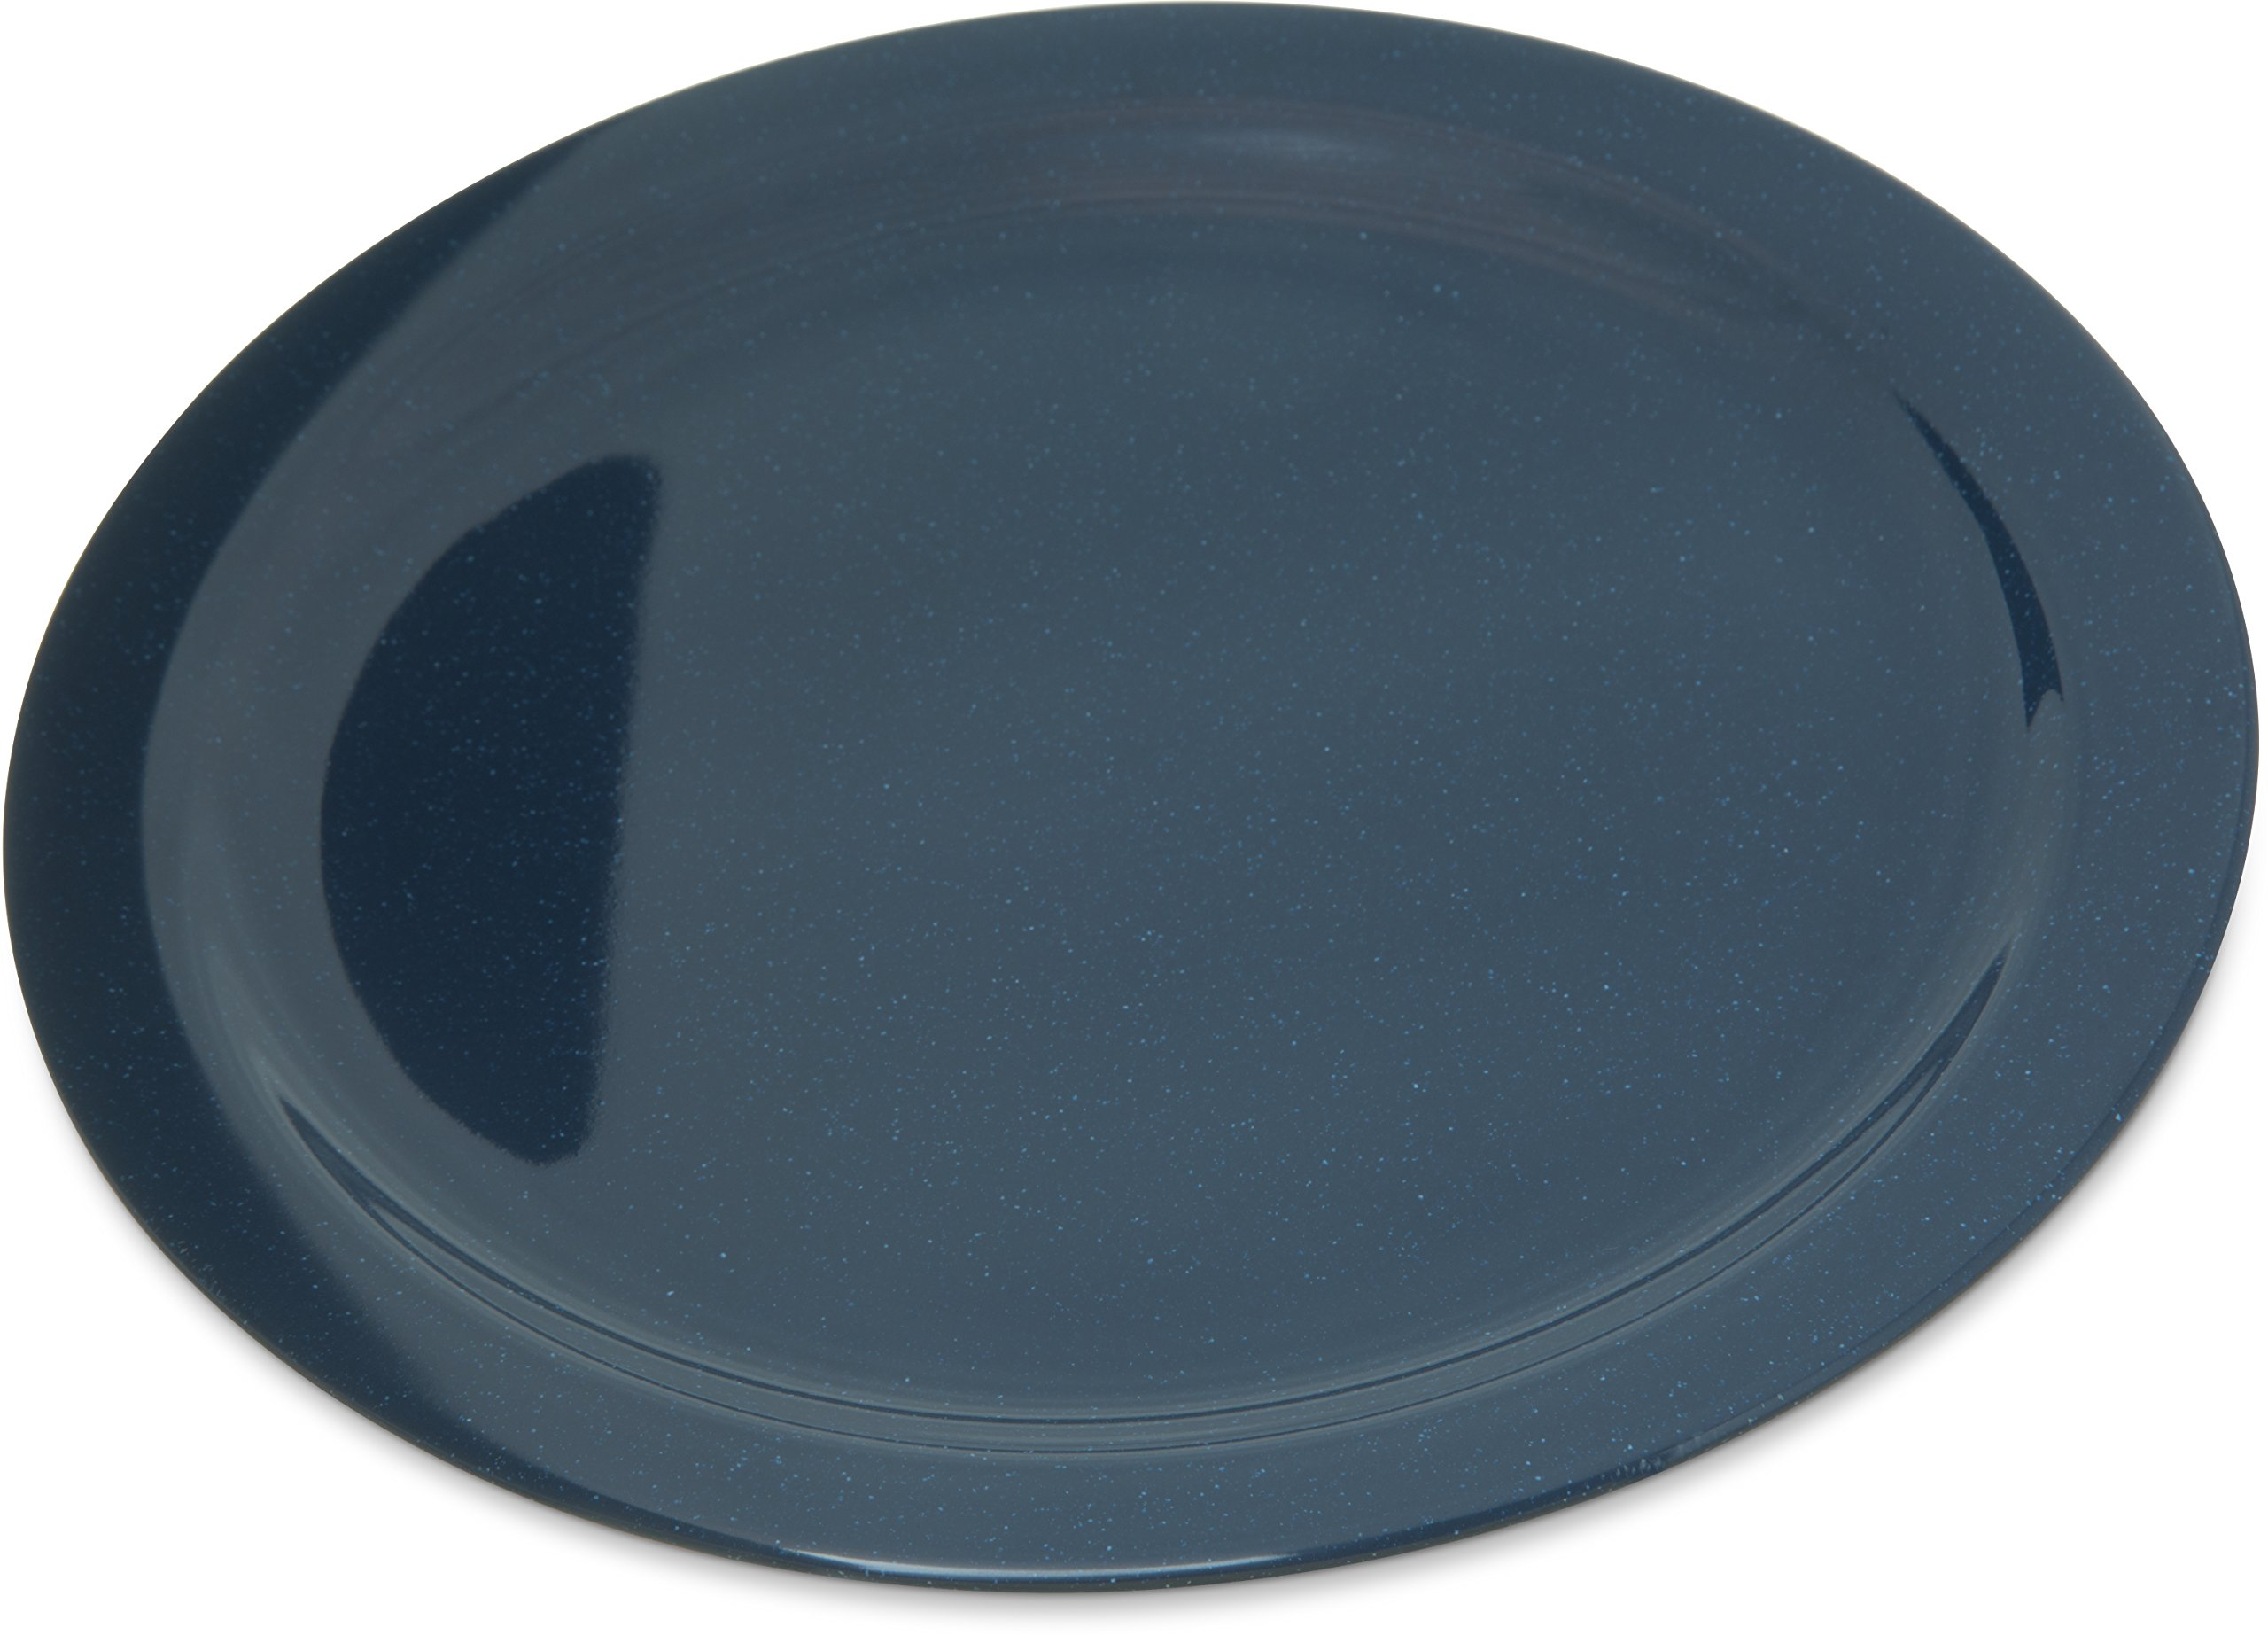 Carlisle 4350035 Dallas Ware Melamine Dinner Plate, 10.20'' Dia. x 0.84'' H, Cafe Blue (Case of 48)